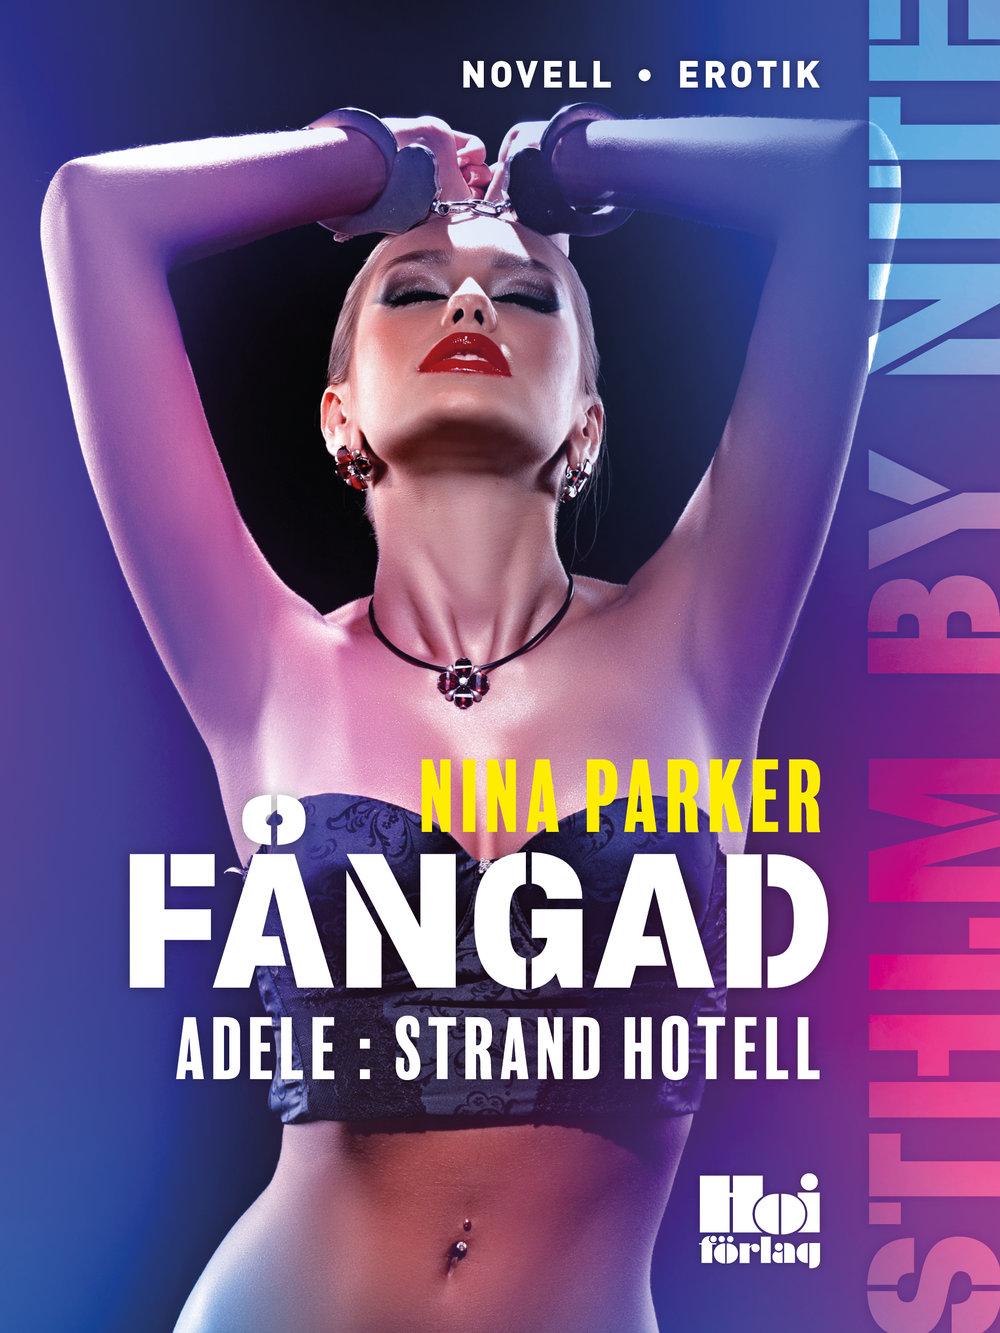 Fångad - Adele : Strand Hotell